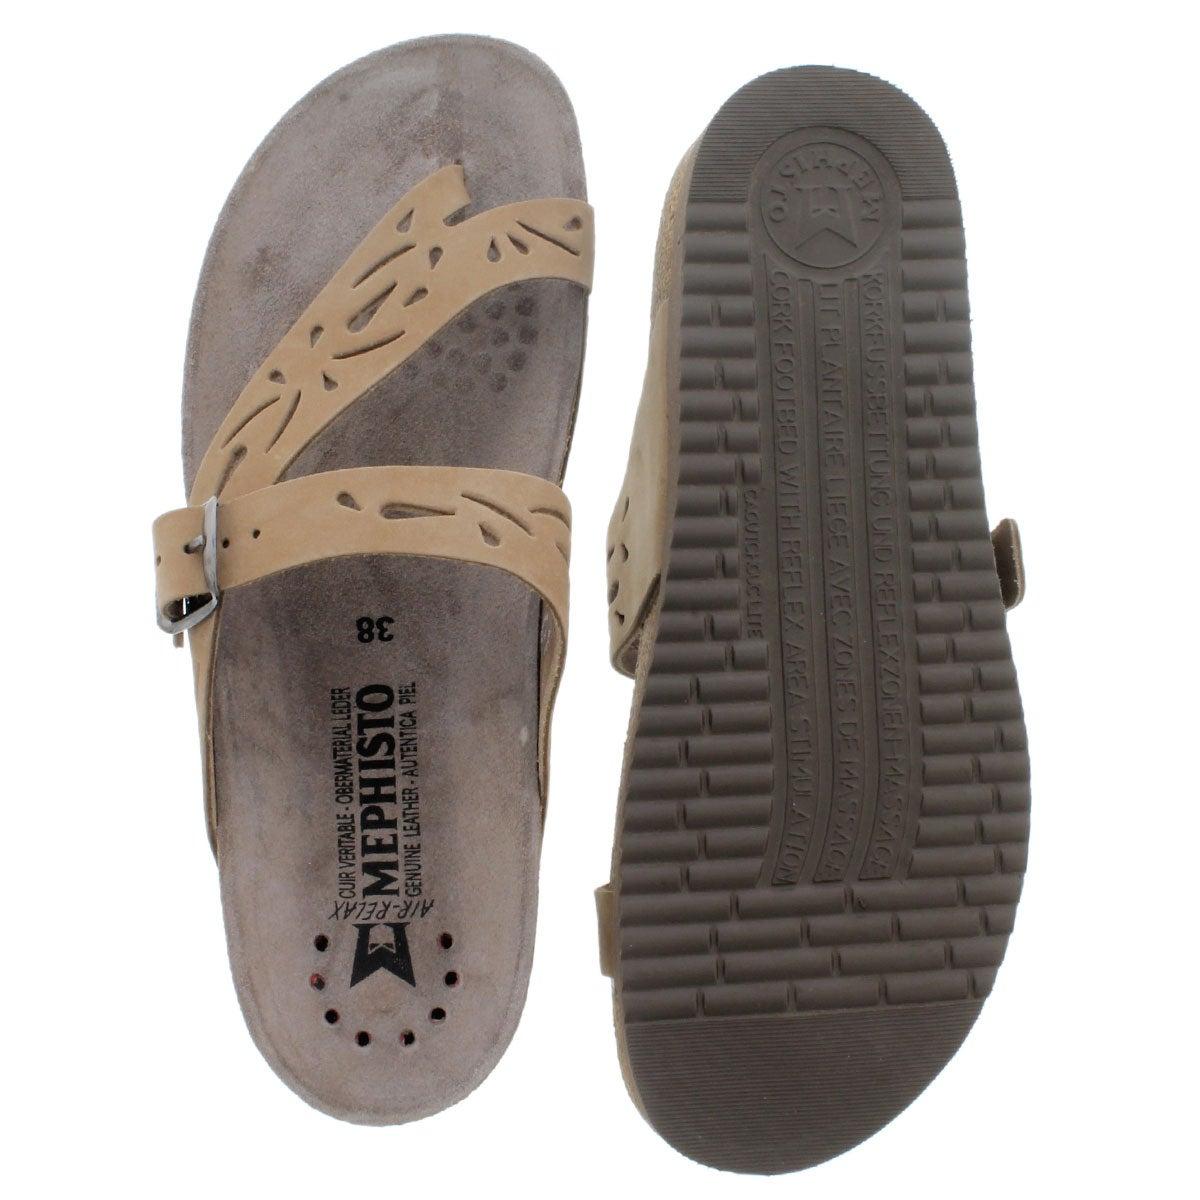 Lds Helen Perf lt bge cork footbed thong